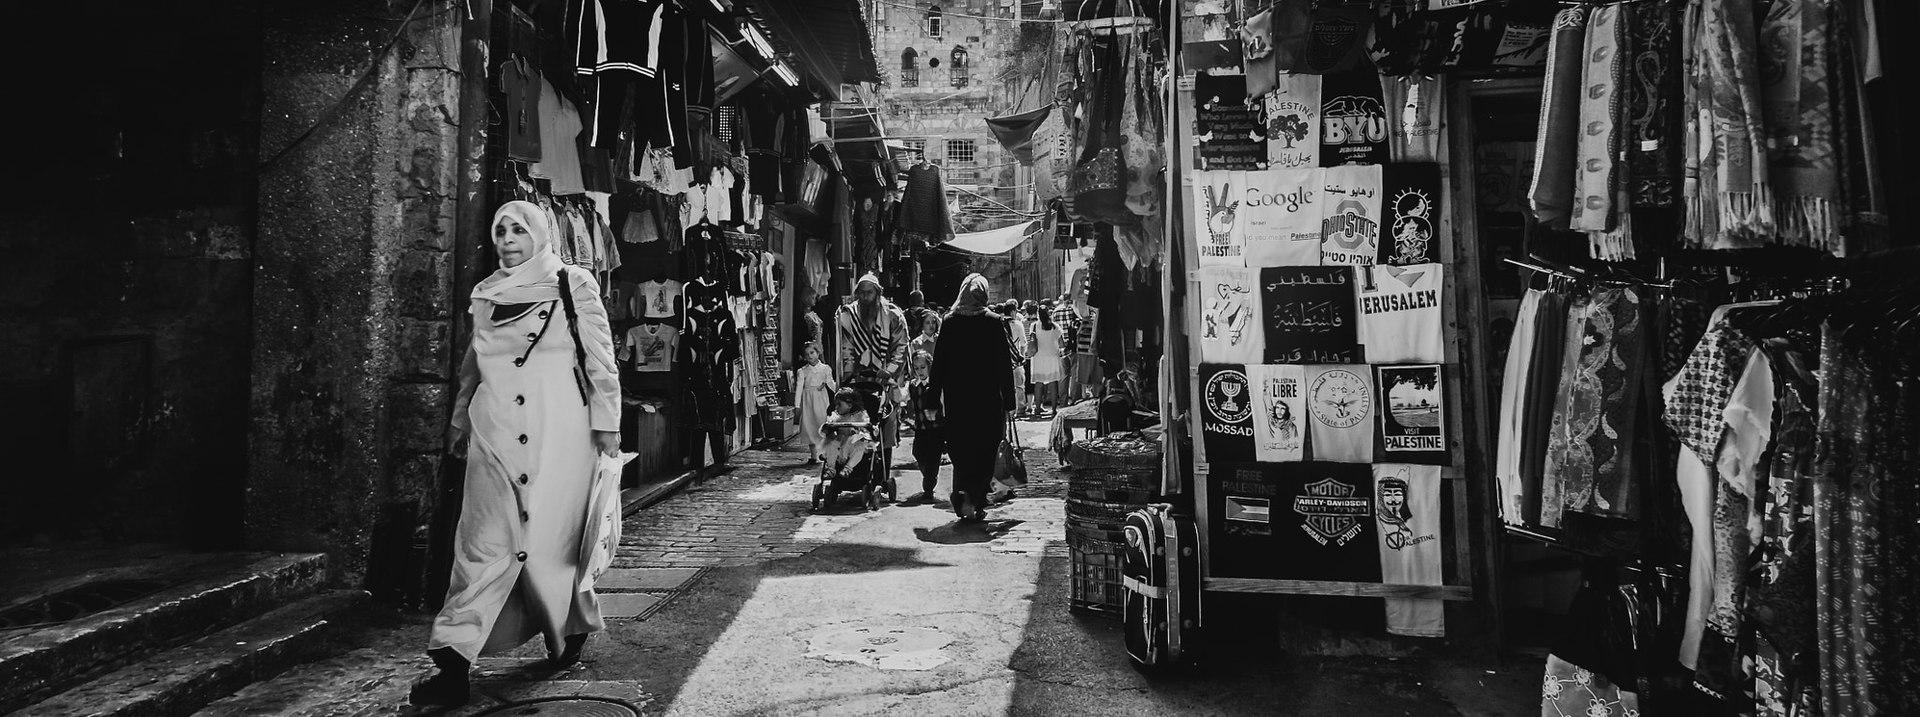 Old City Souk, Jerusalem (in black and white)